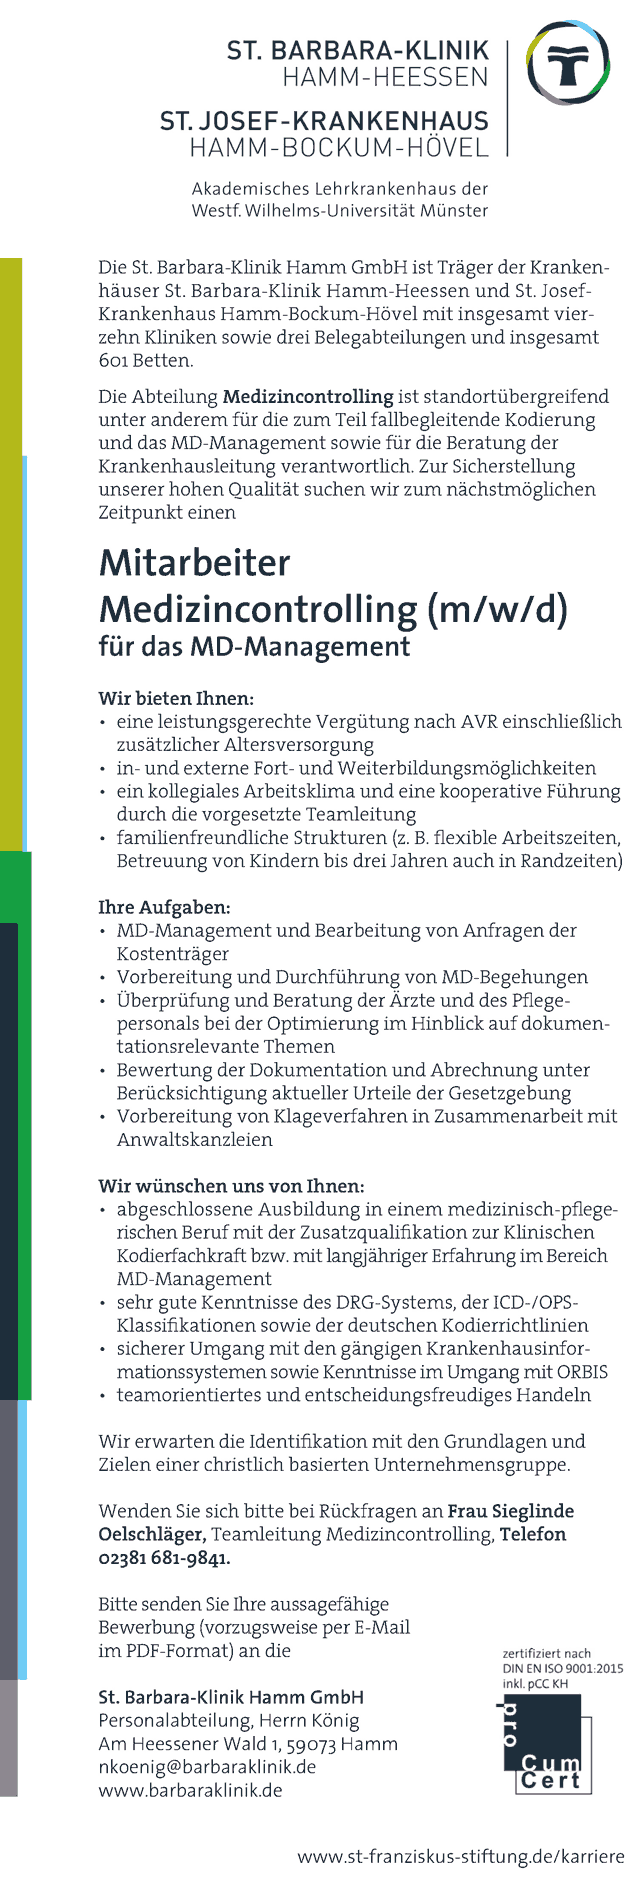 St. Barbara-Klinik Hamm GmbH: Mitarbeiter Medizincontrolling (m/w/d)